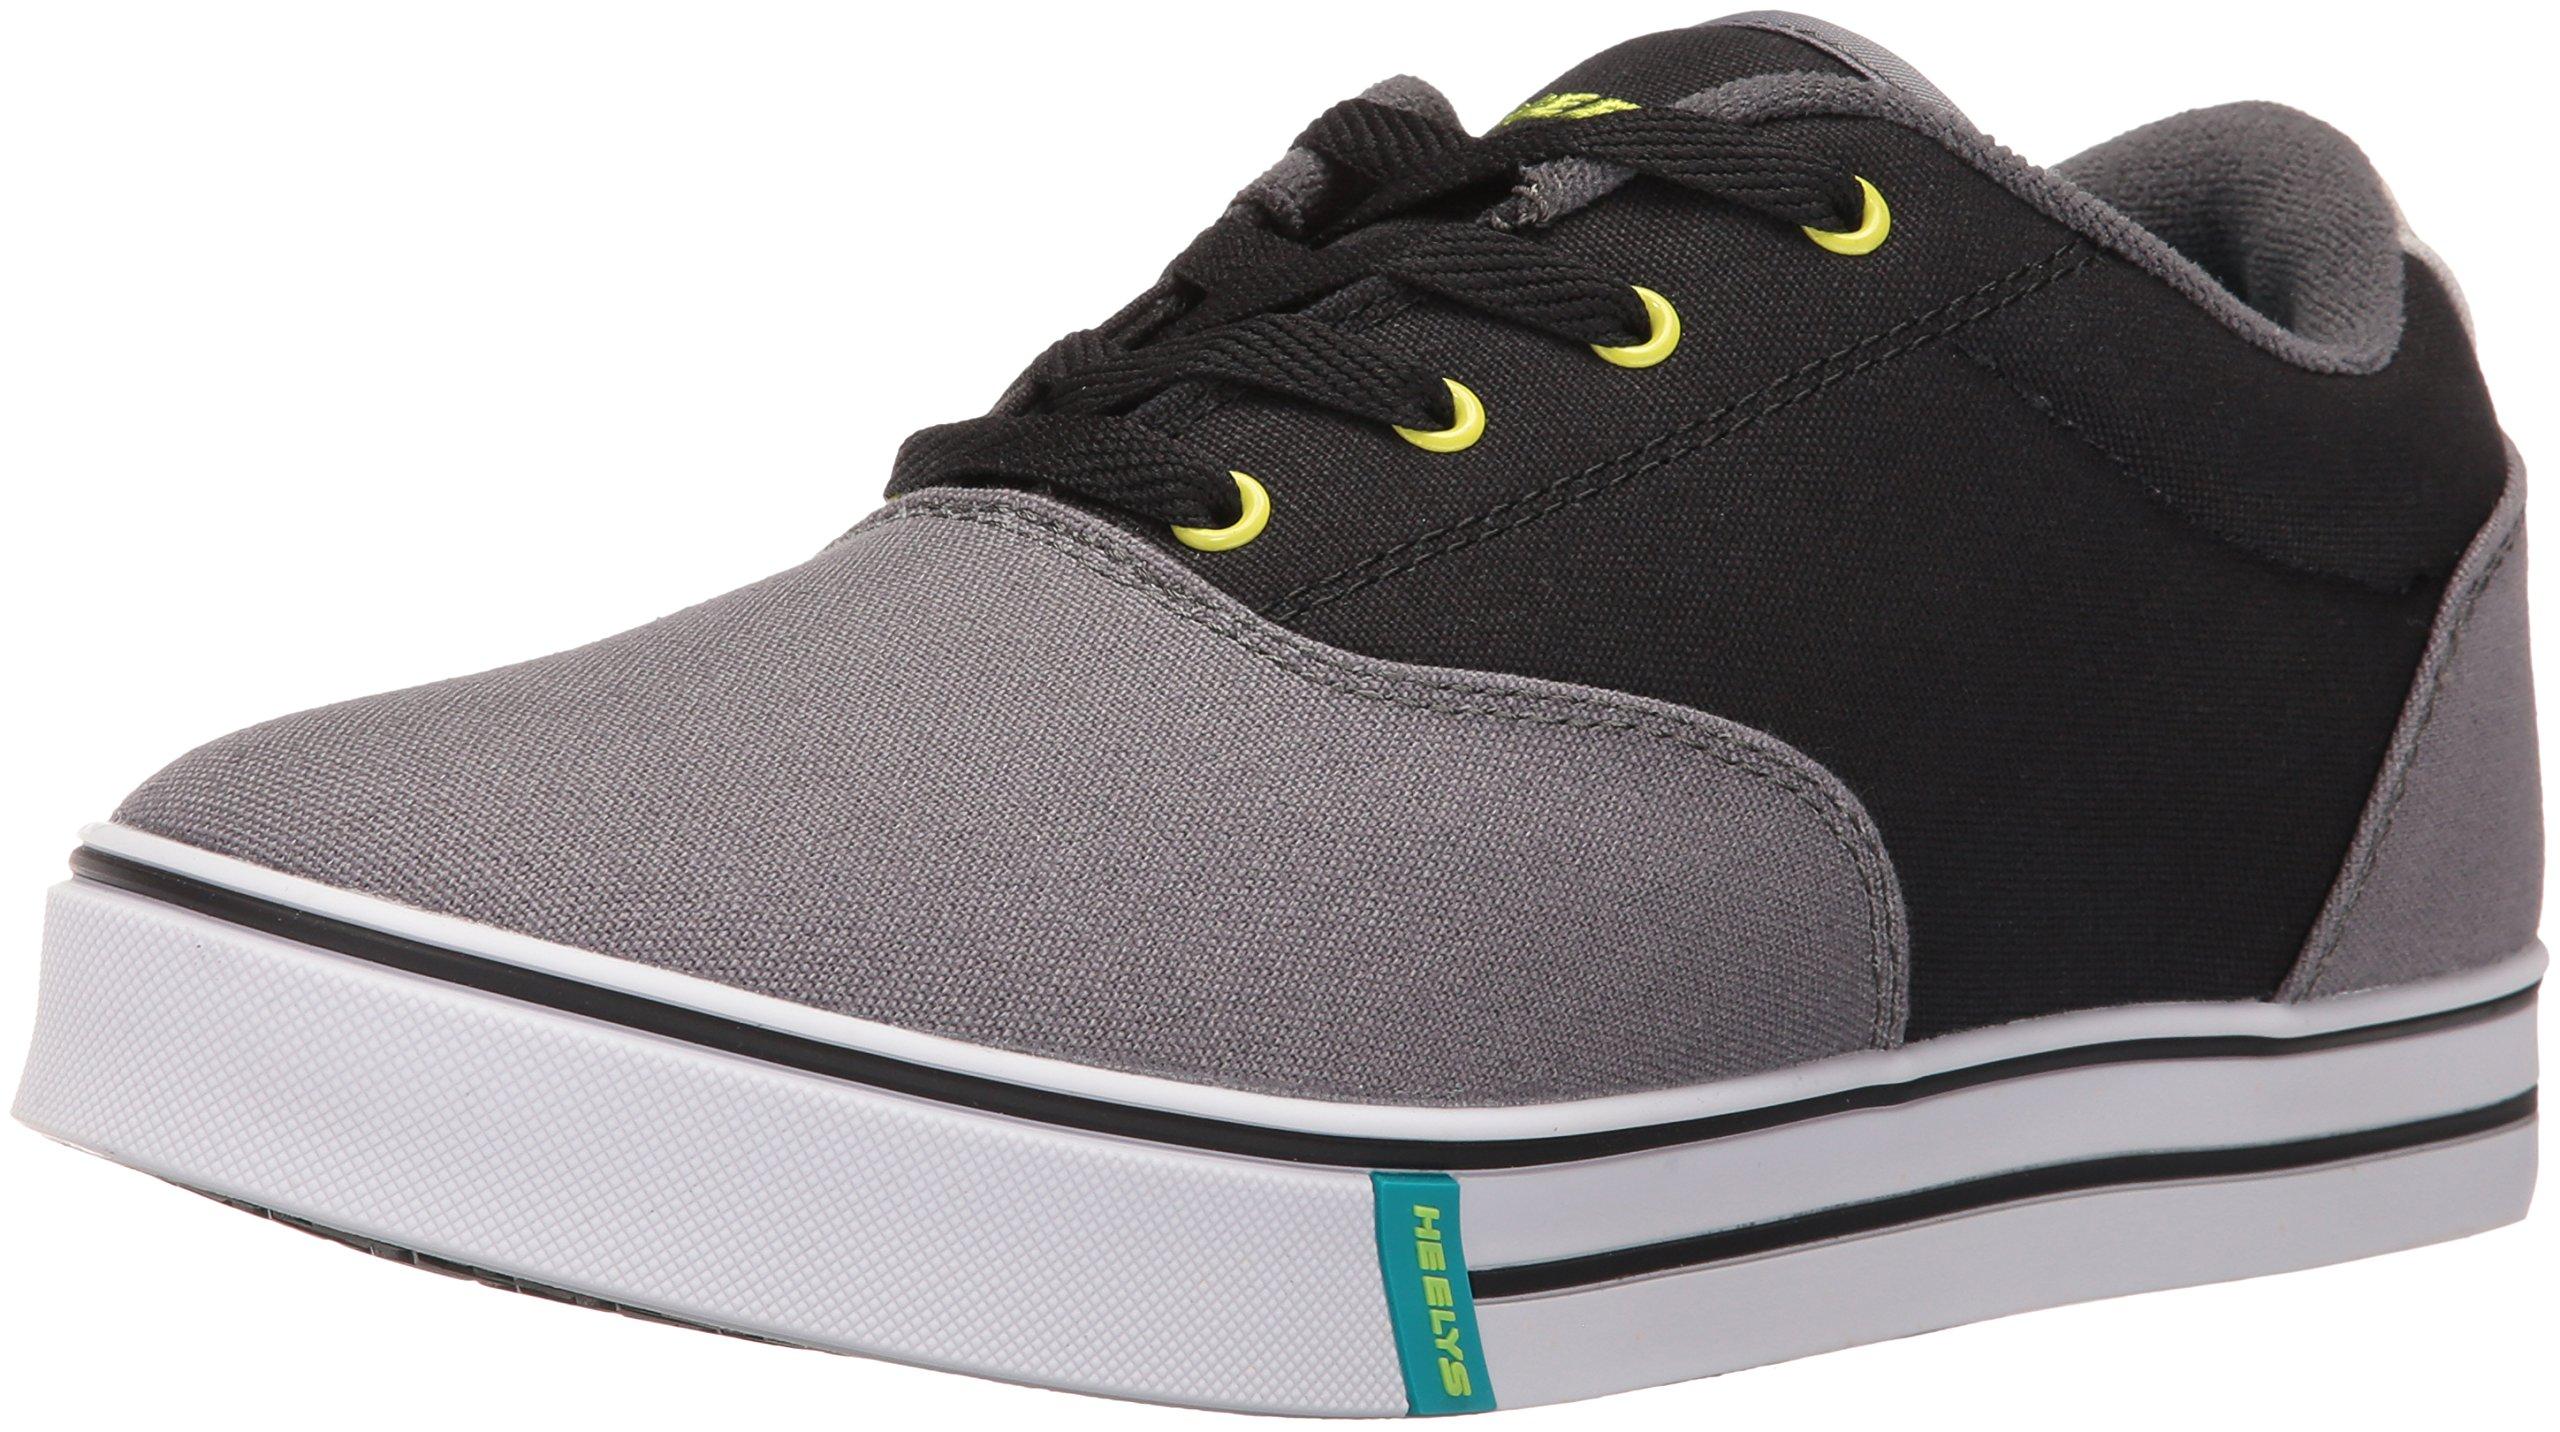 Heelys Men's Launch Fashion Sneaker Charcoal/Black/Lime 9 M US